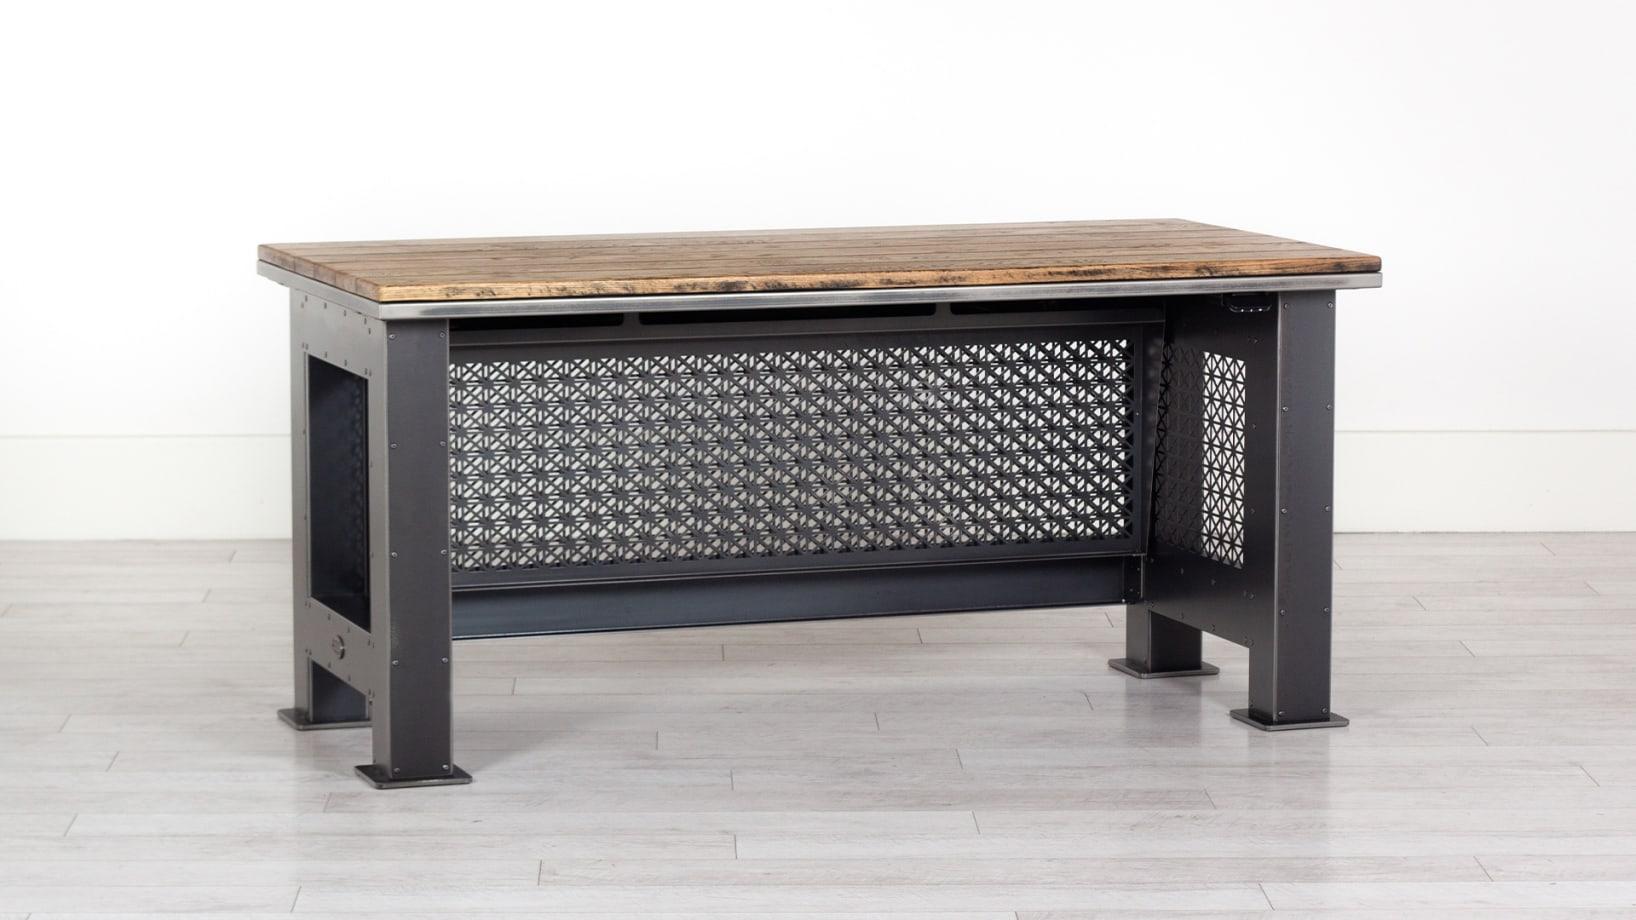 Steel Vintage grand artisan height adjustable desk at normal height